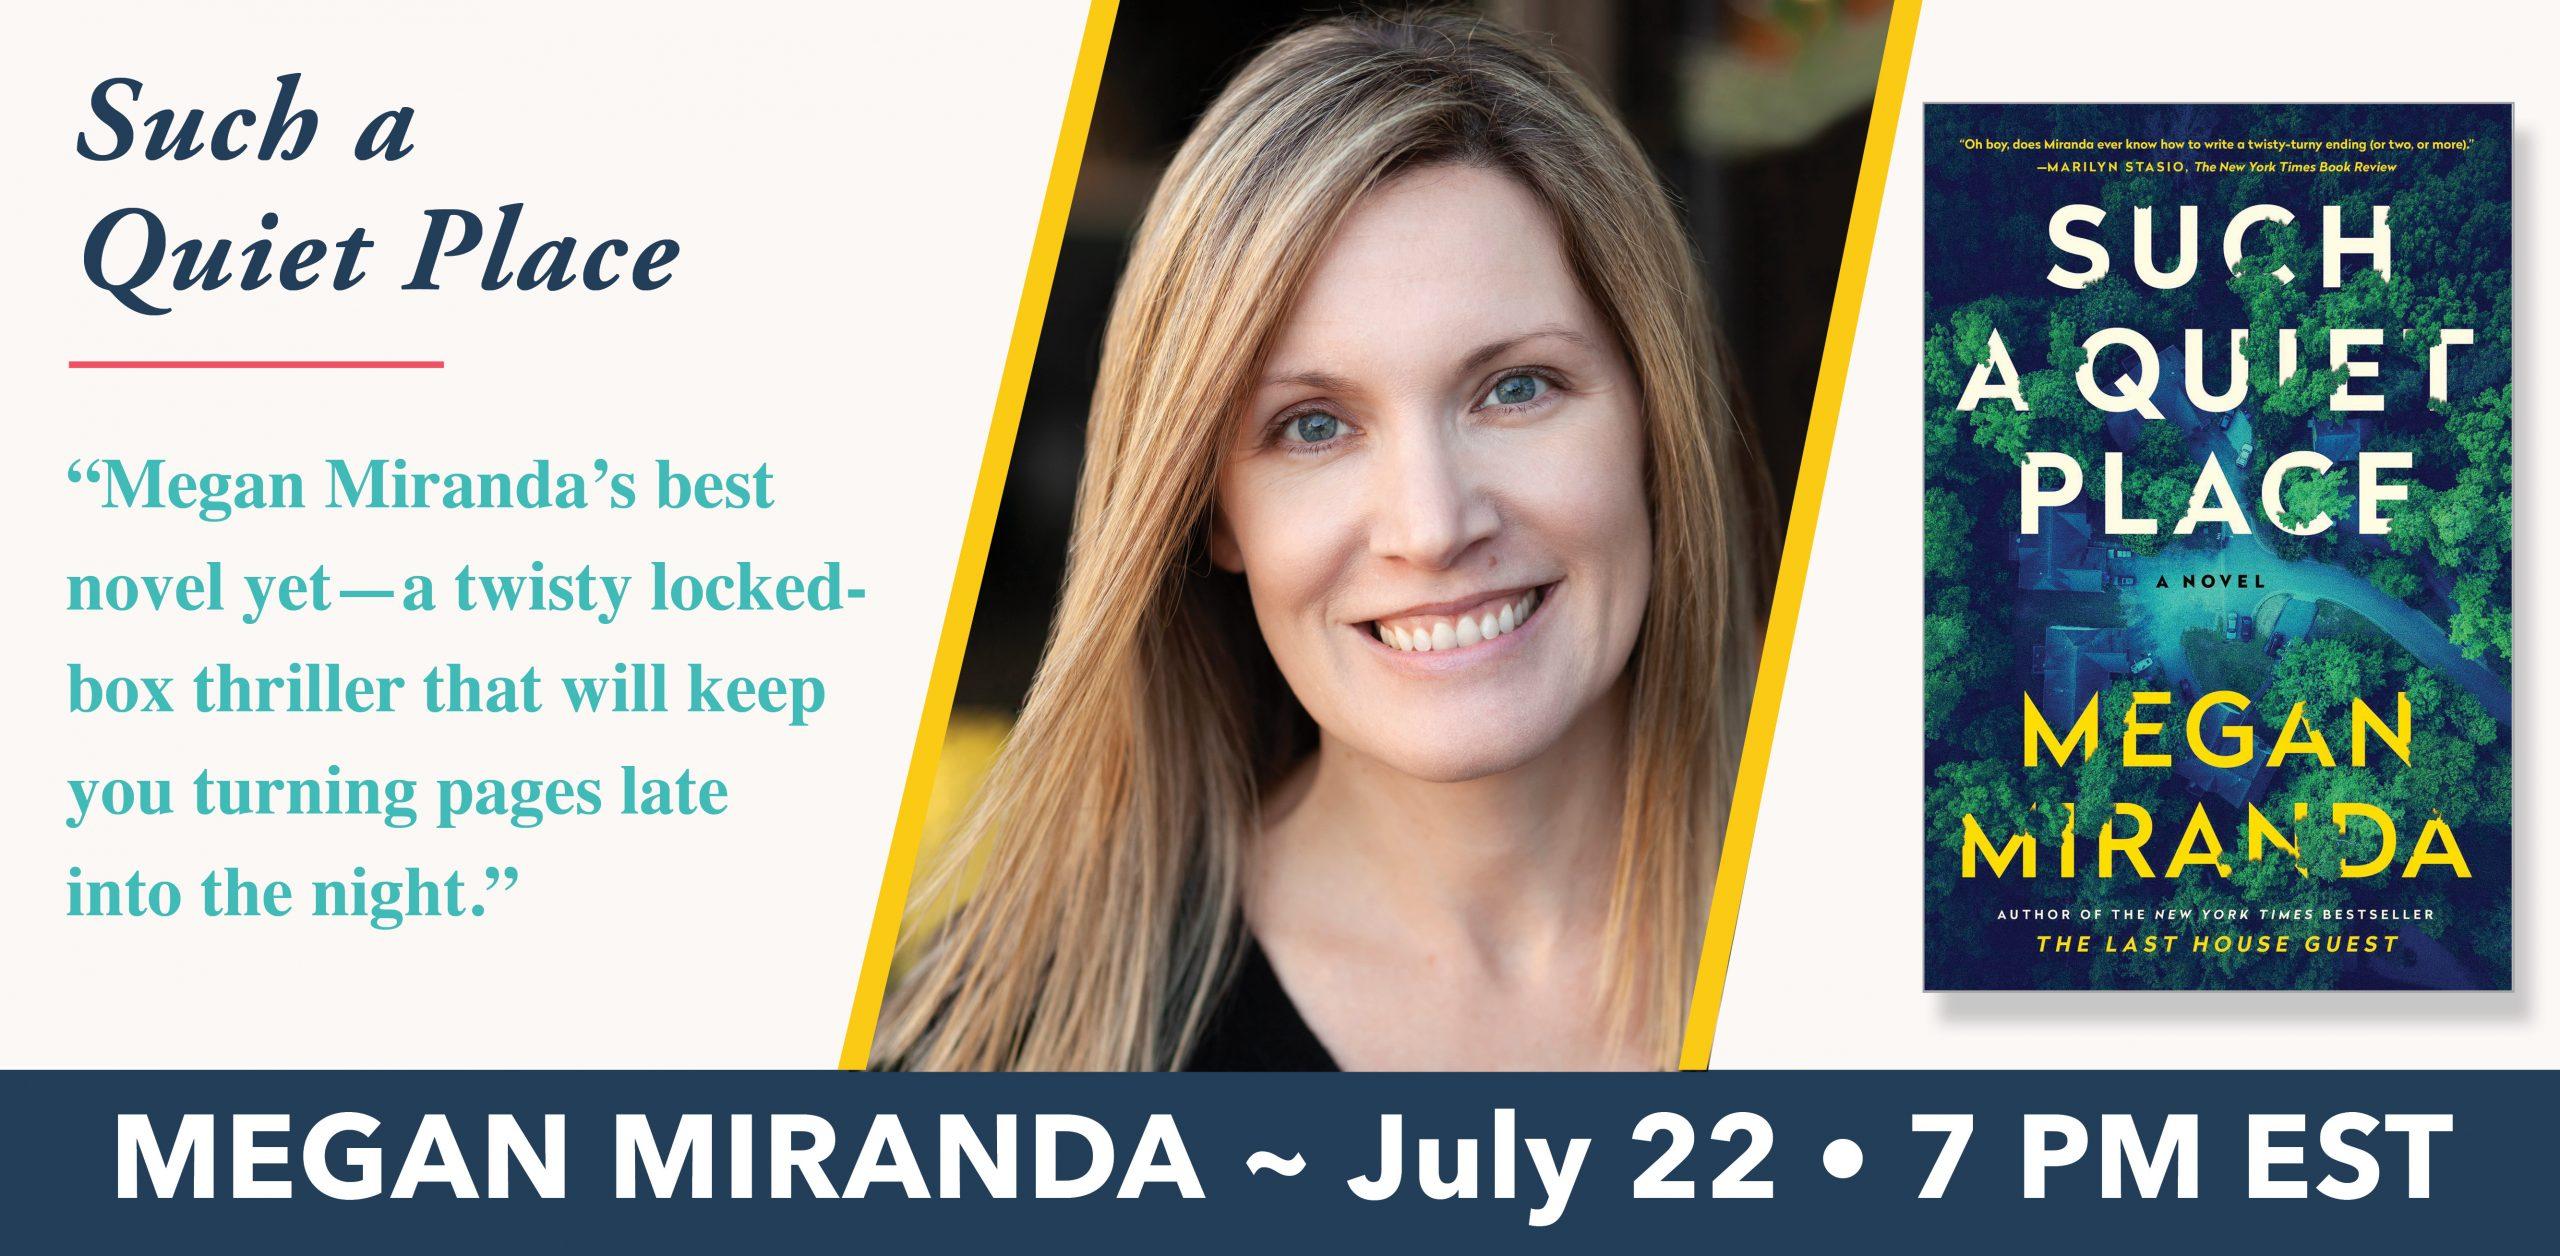 PRESS RELEASE: An Evening with Megan Miranda